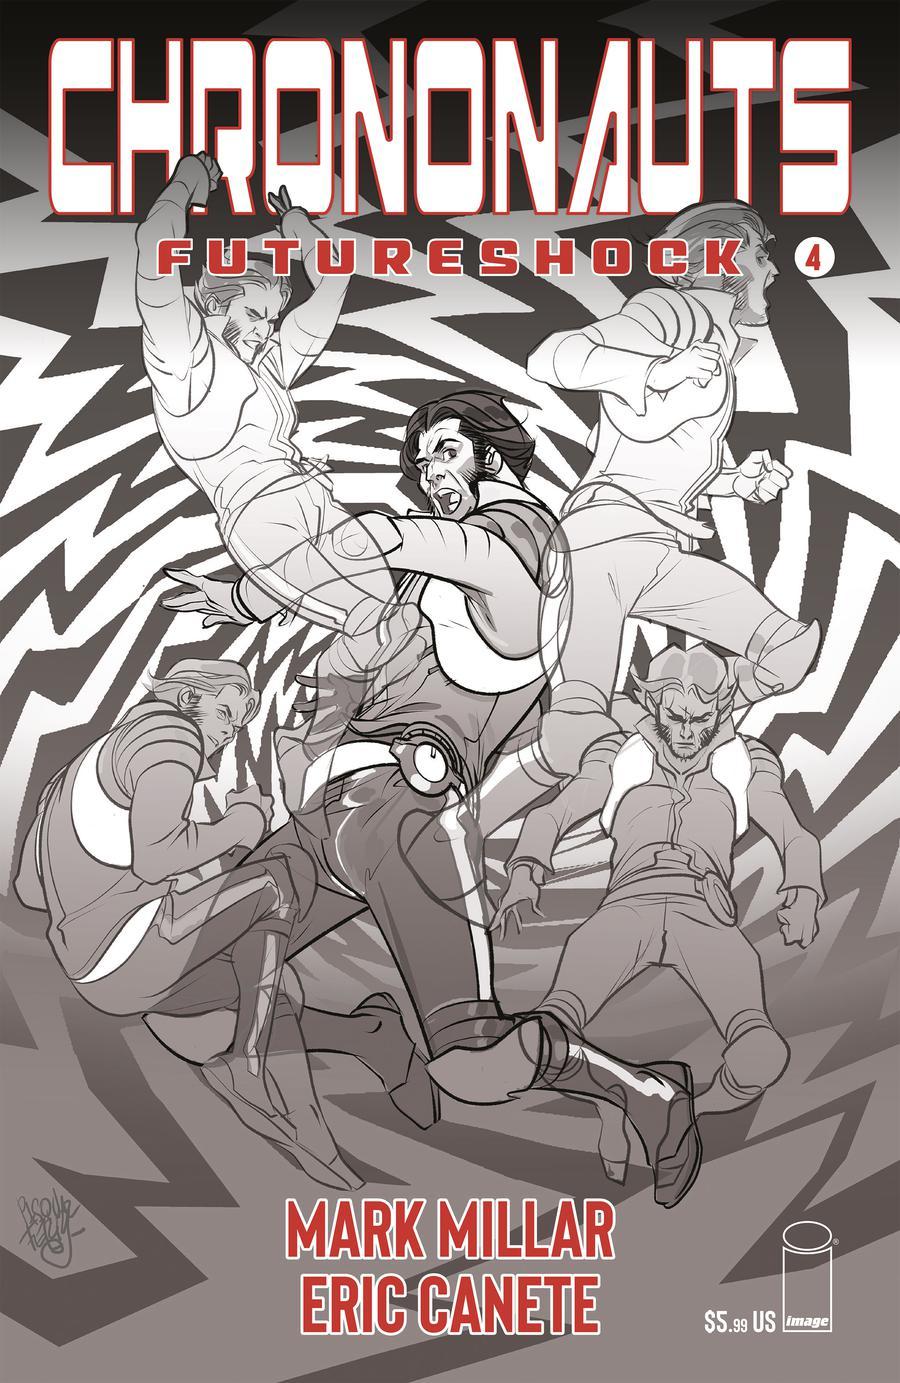 Chrononauts Futureshock #4 Cover B Variant Pasqual Ferry Black & White Cover